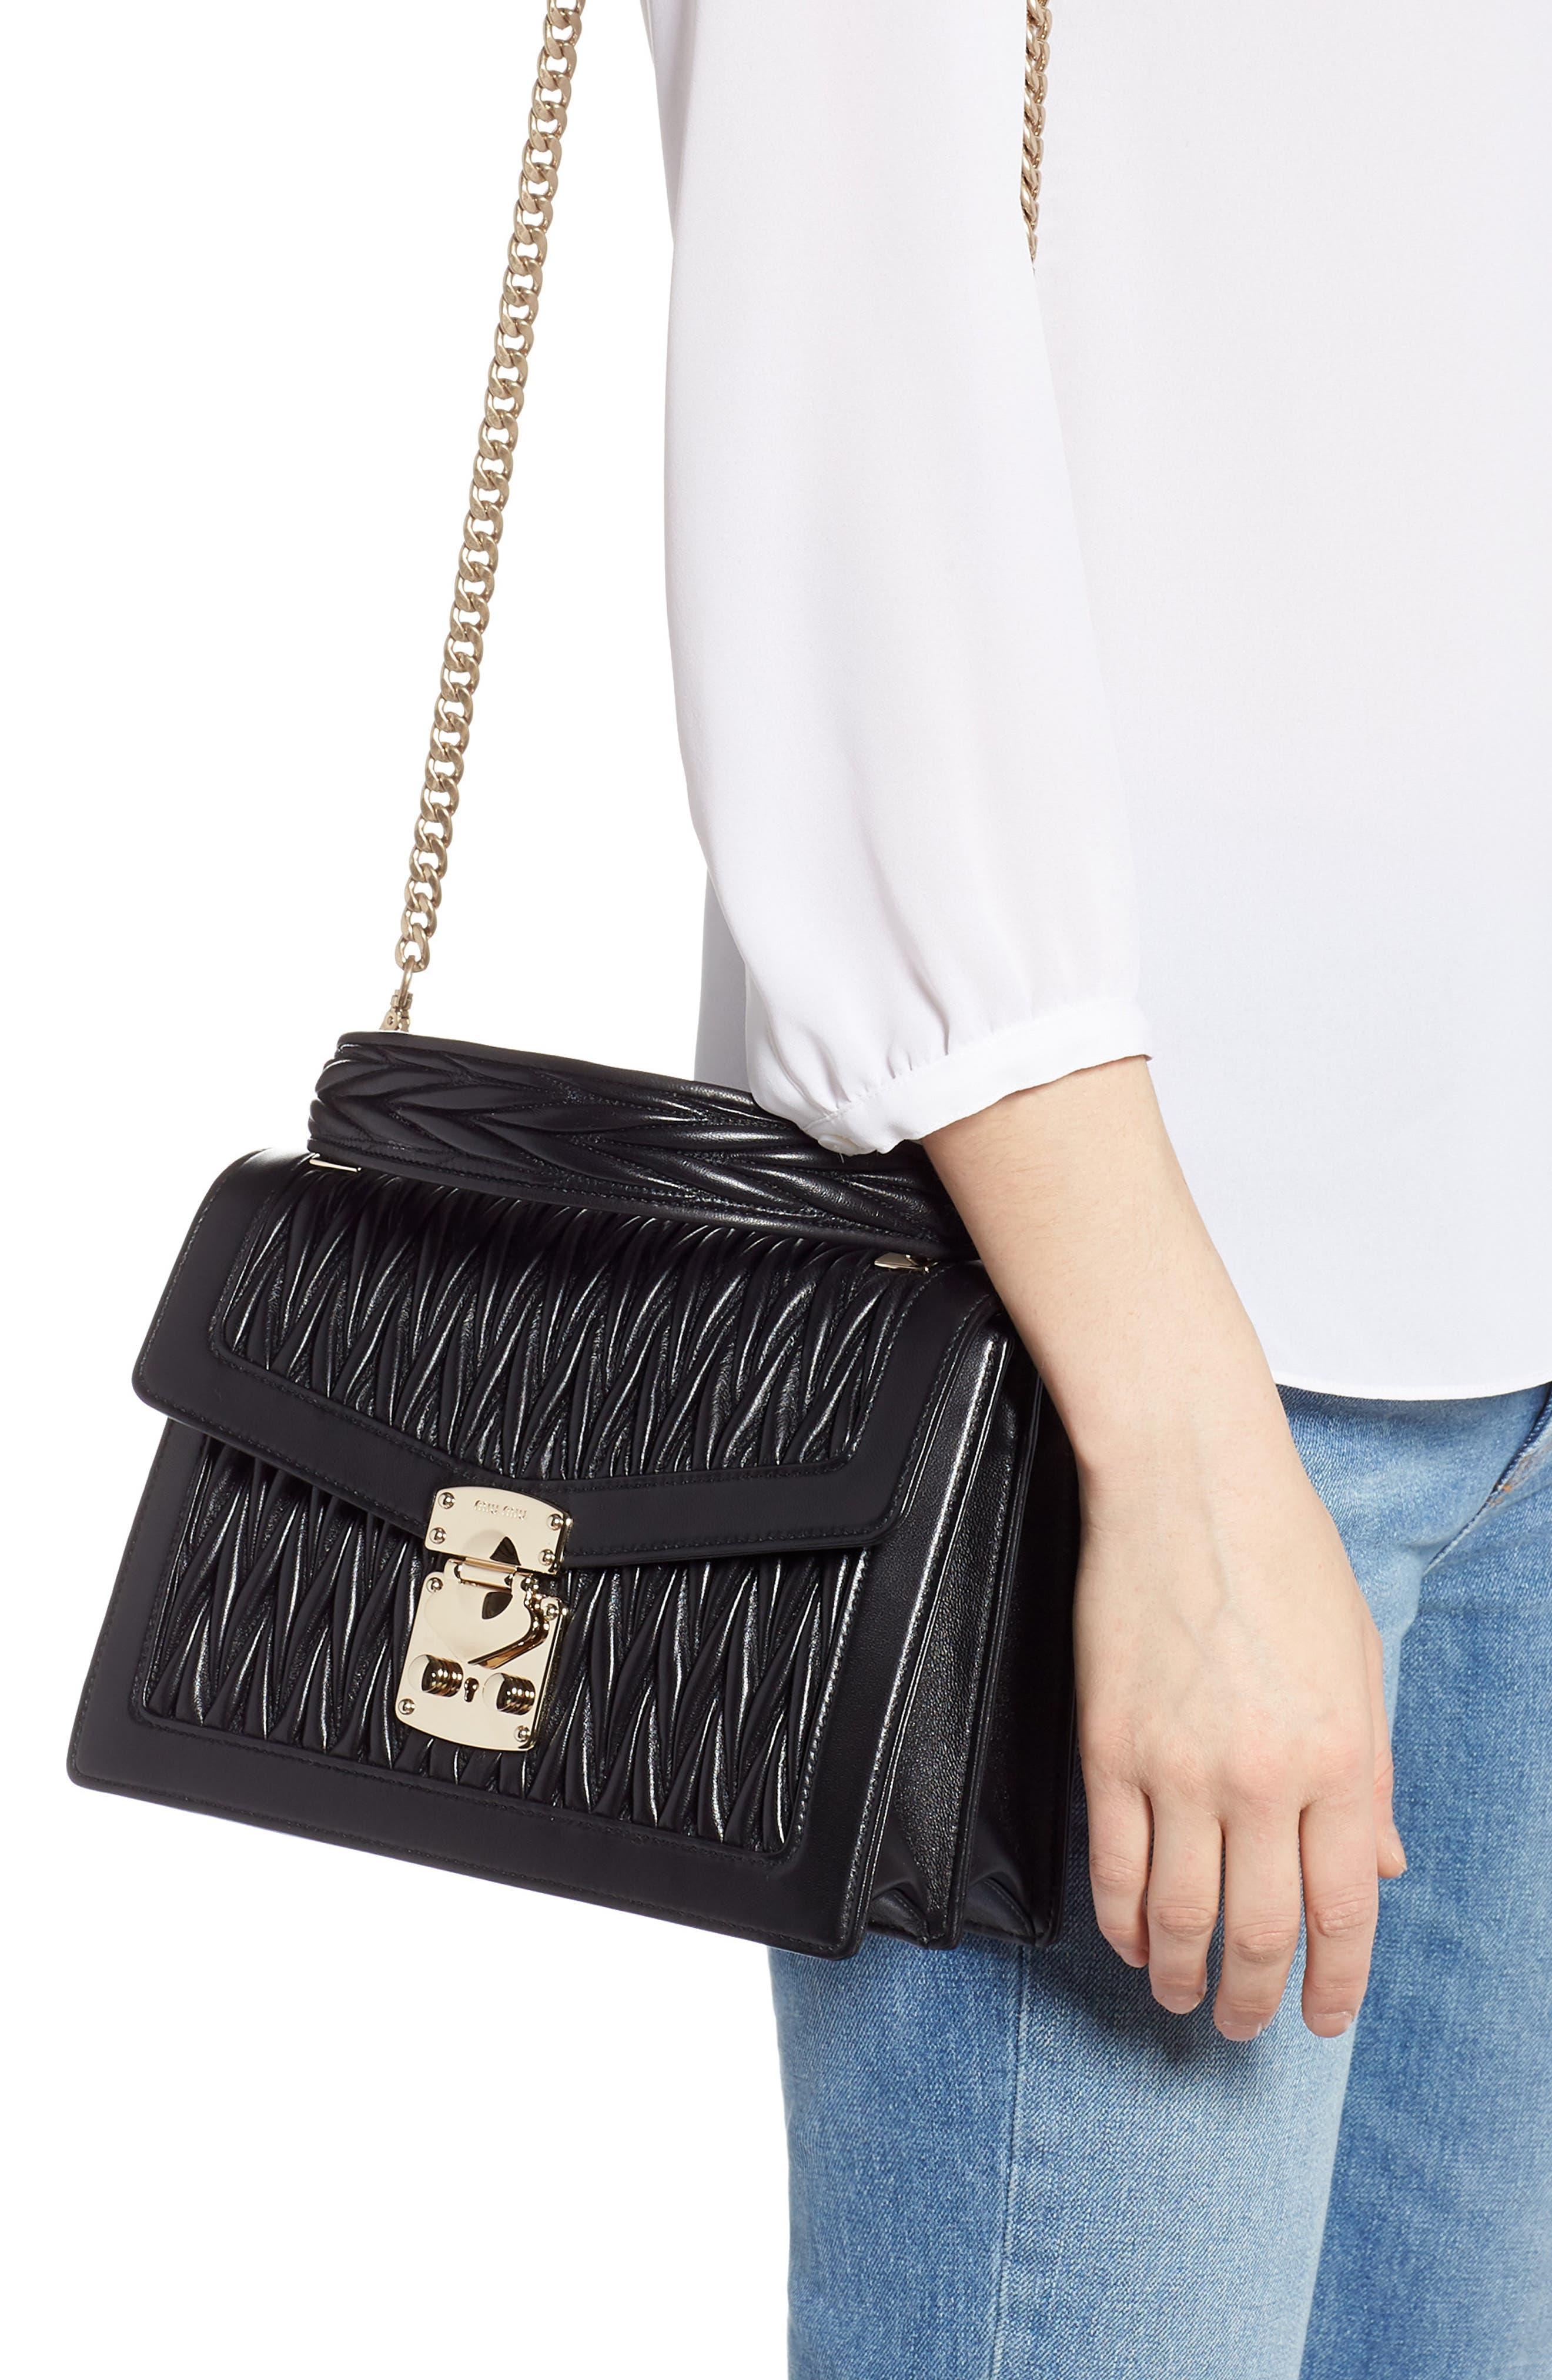 Confidential Matelassé Quilted Lambskin Leather Top Handle Bag,                             Alternate thumbnail 2, color,                             NERO